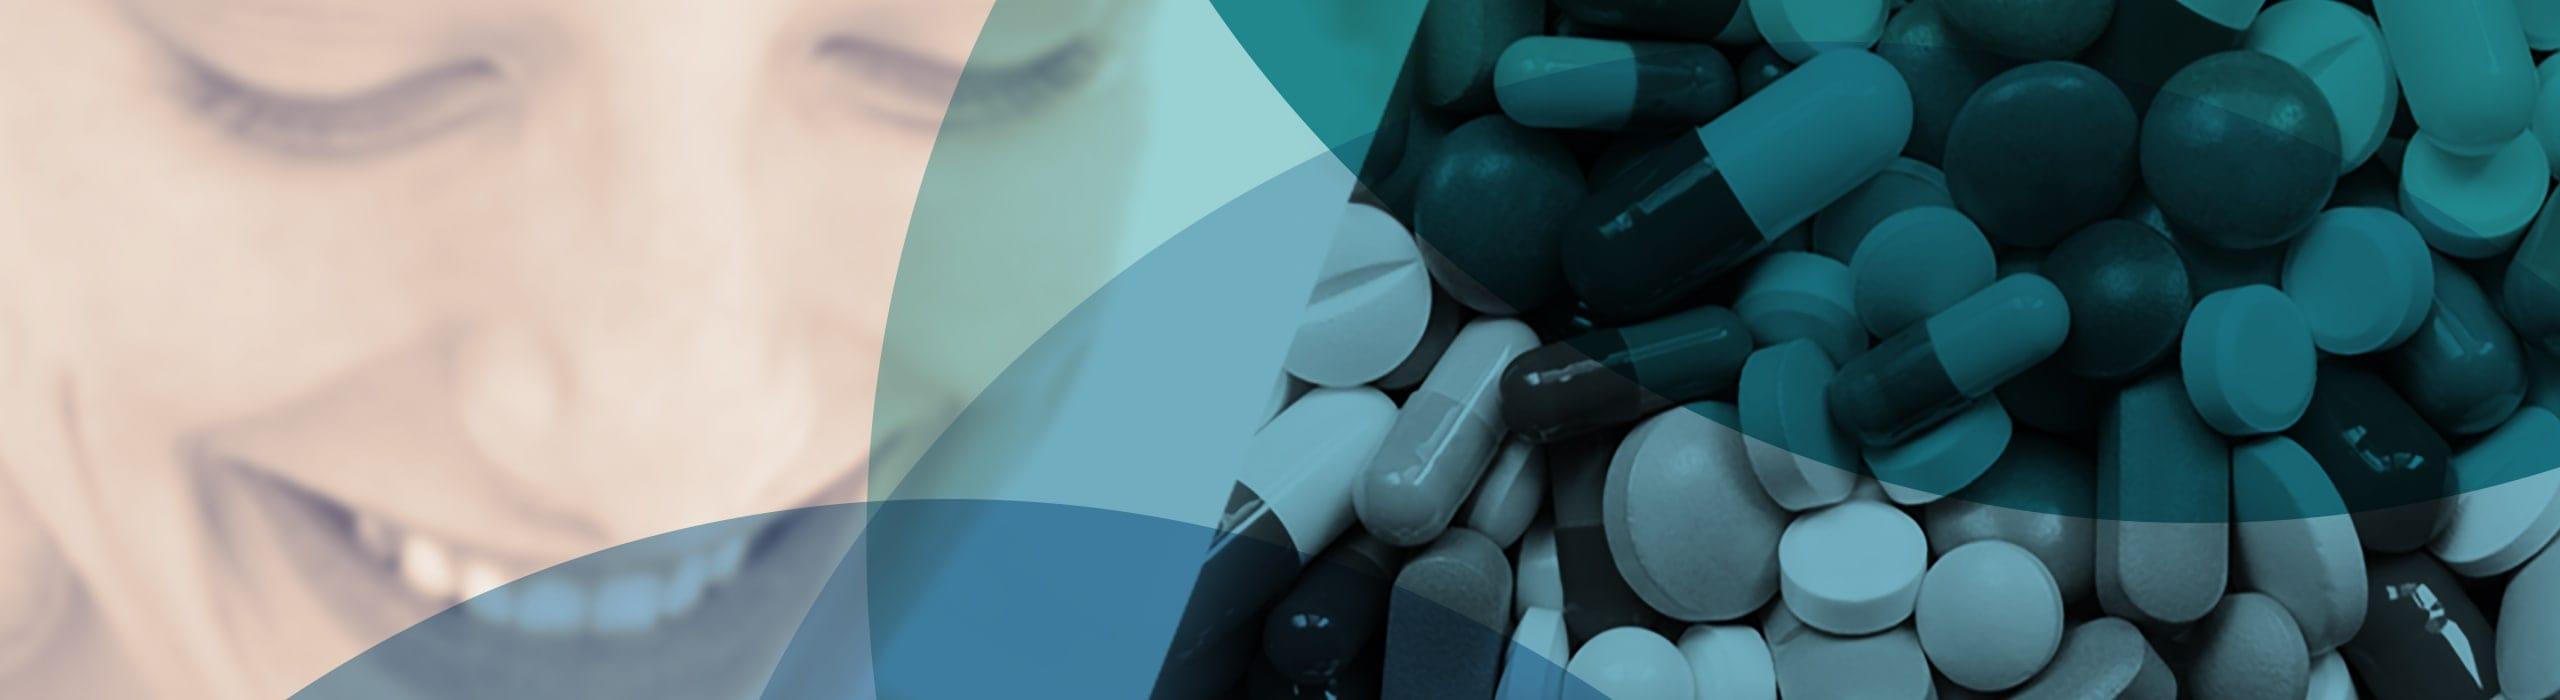 Medisafe - natie-medisafe-banner - Natie Branding Agency